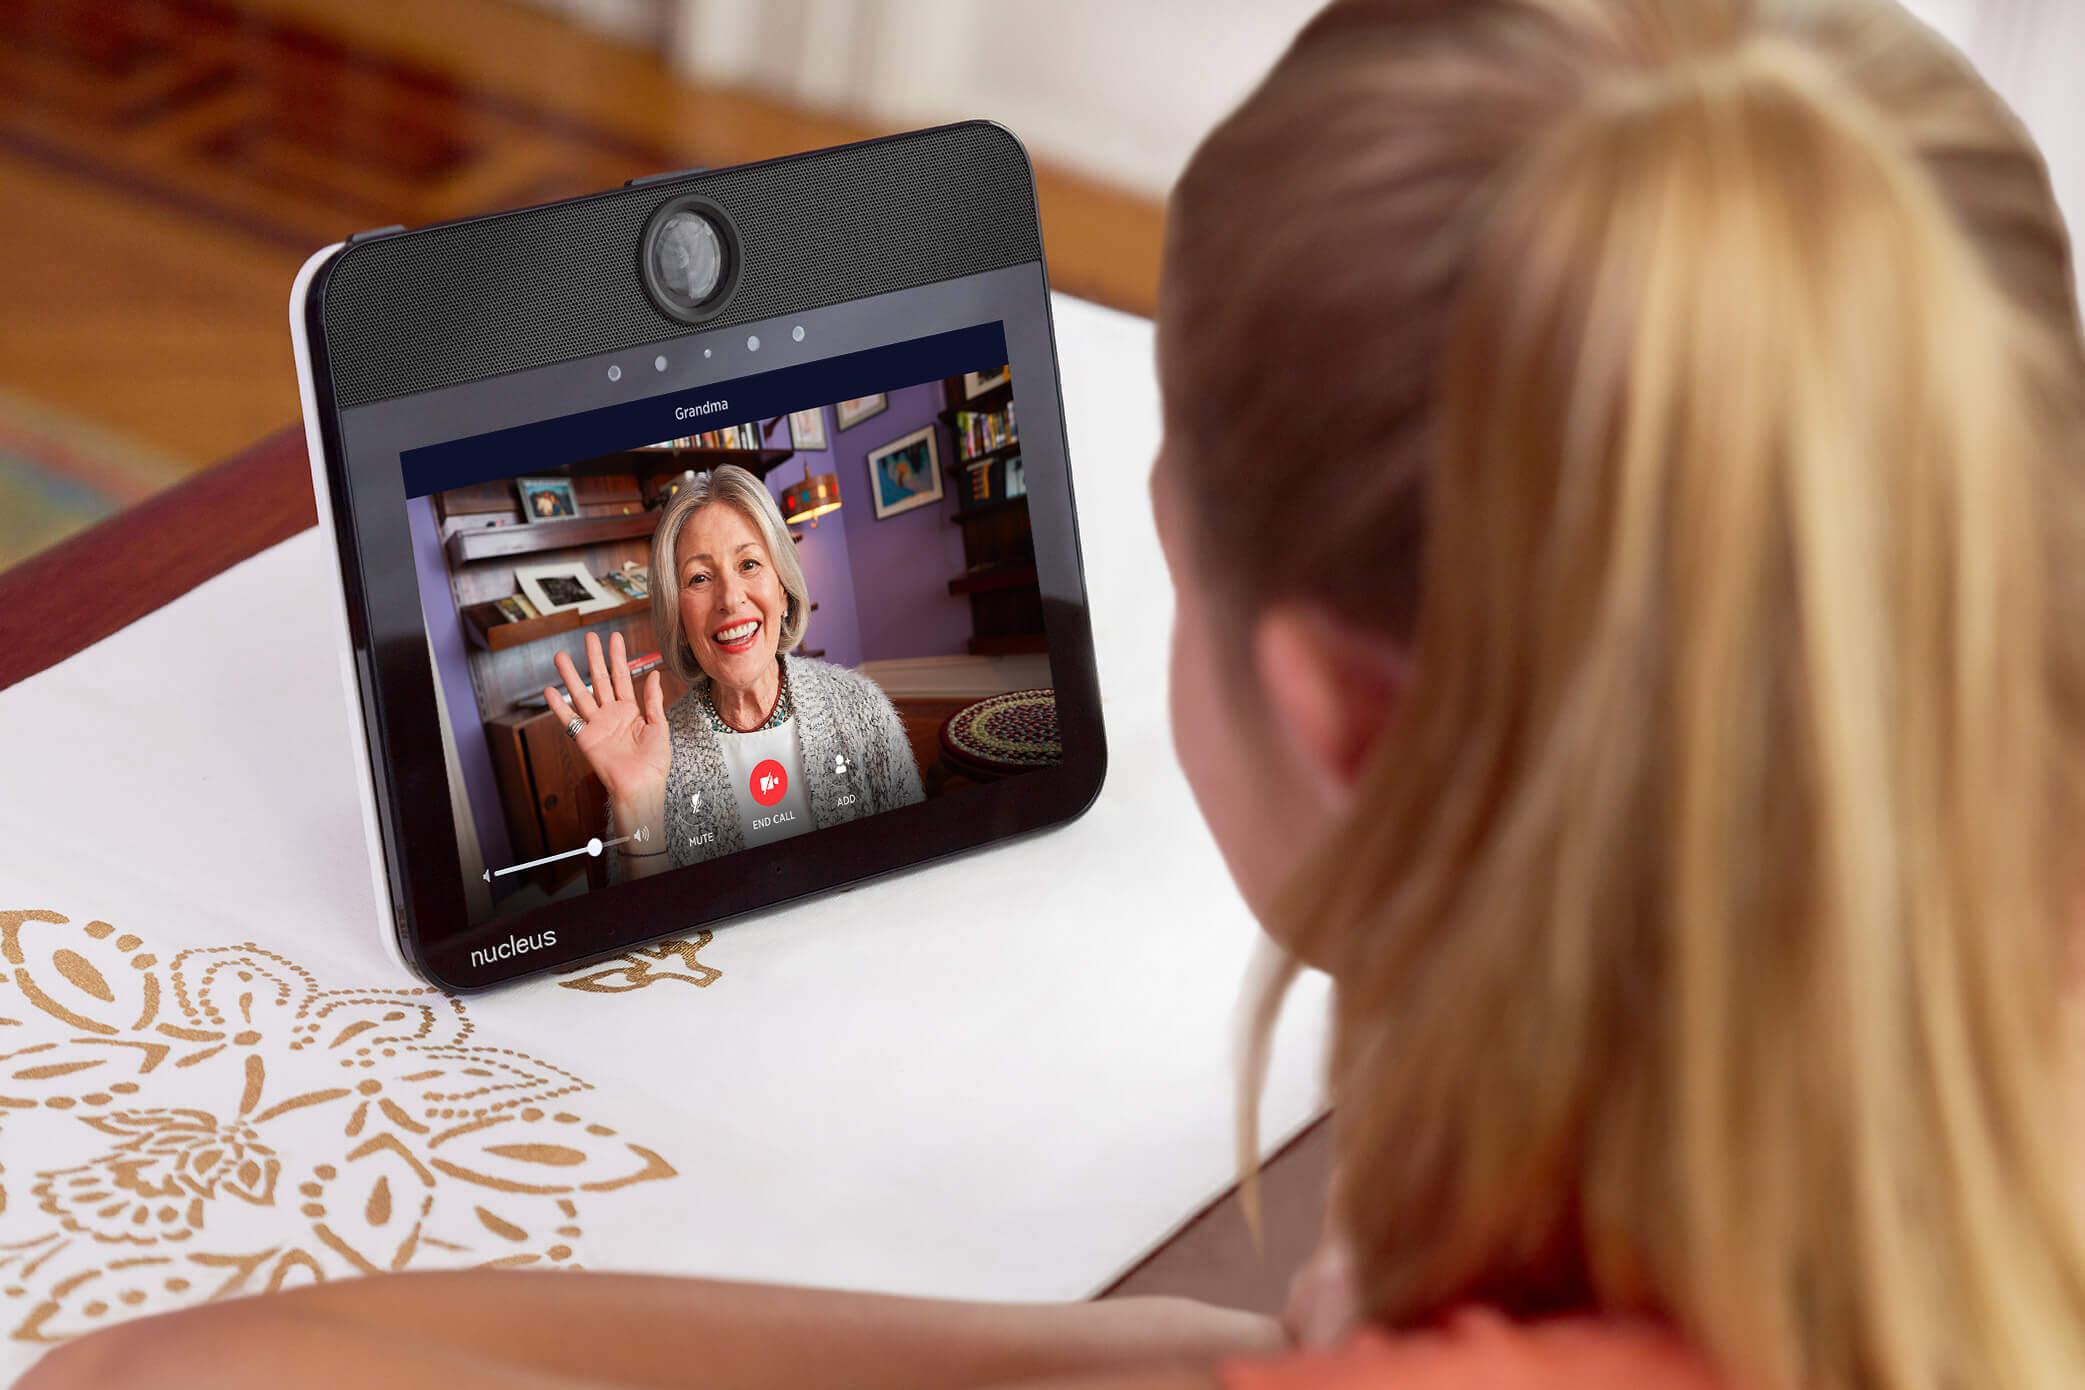 Nucleus – Touchscreen Tablet Intercom for Alexa